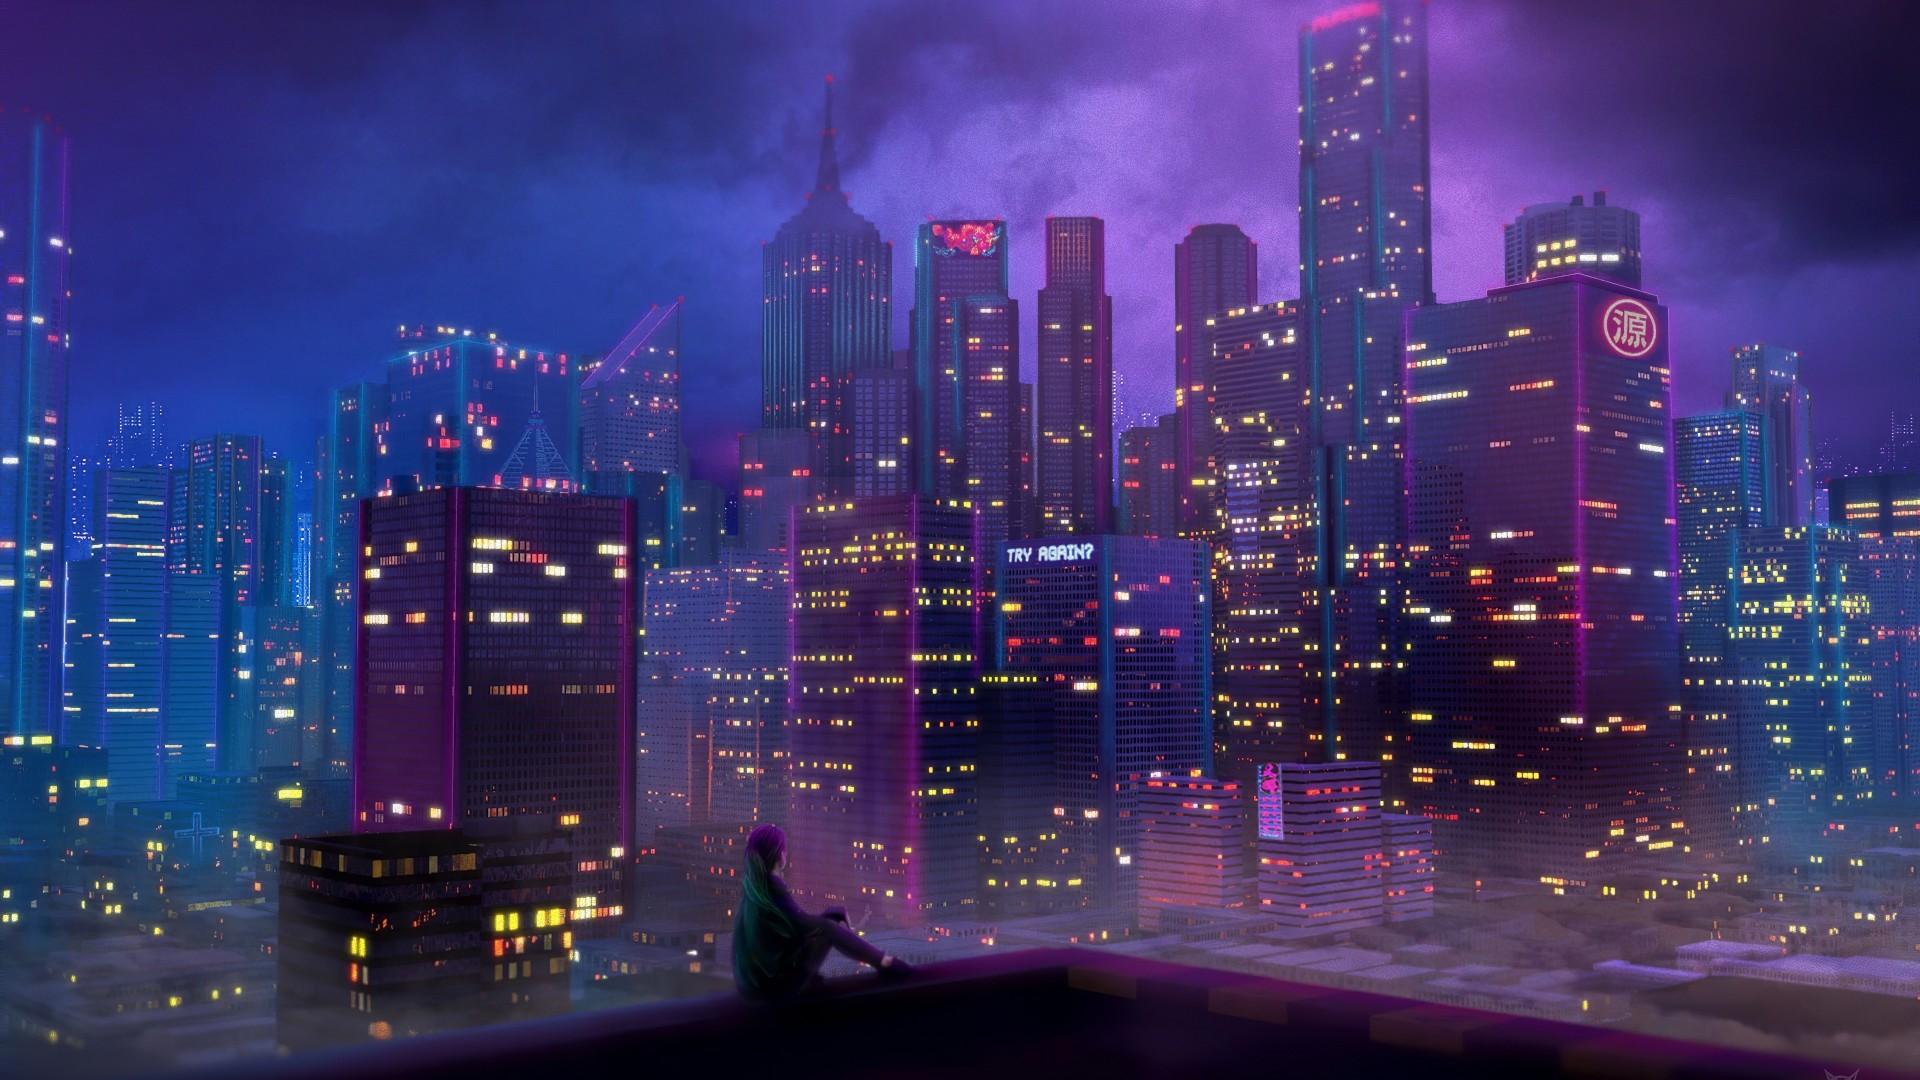 Neon City wallpaper photo